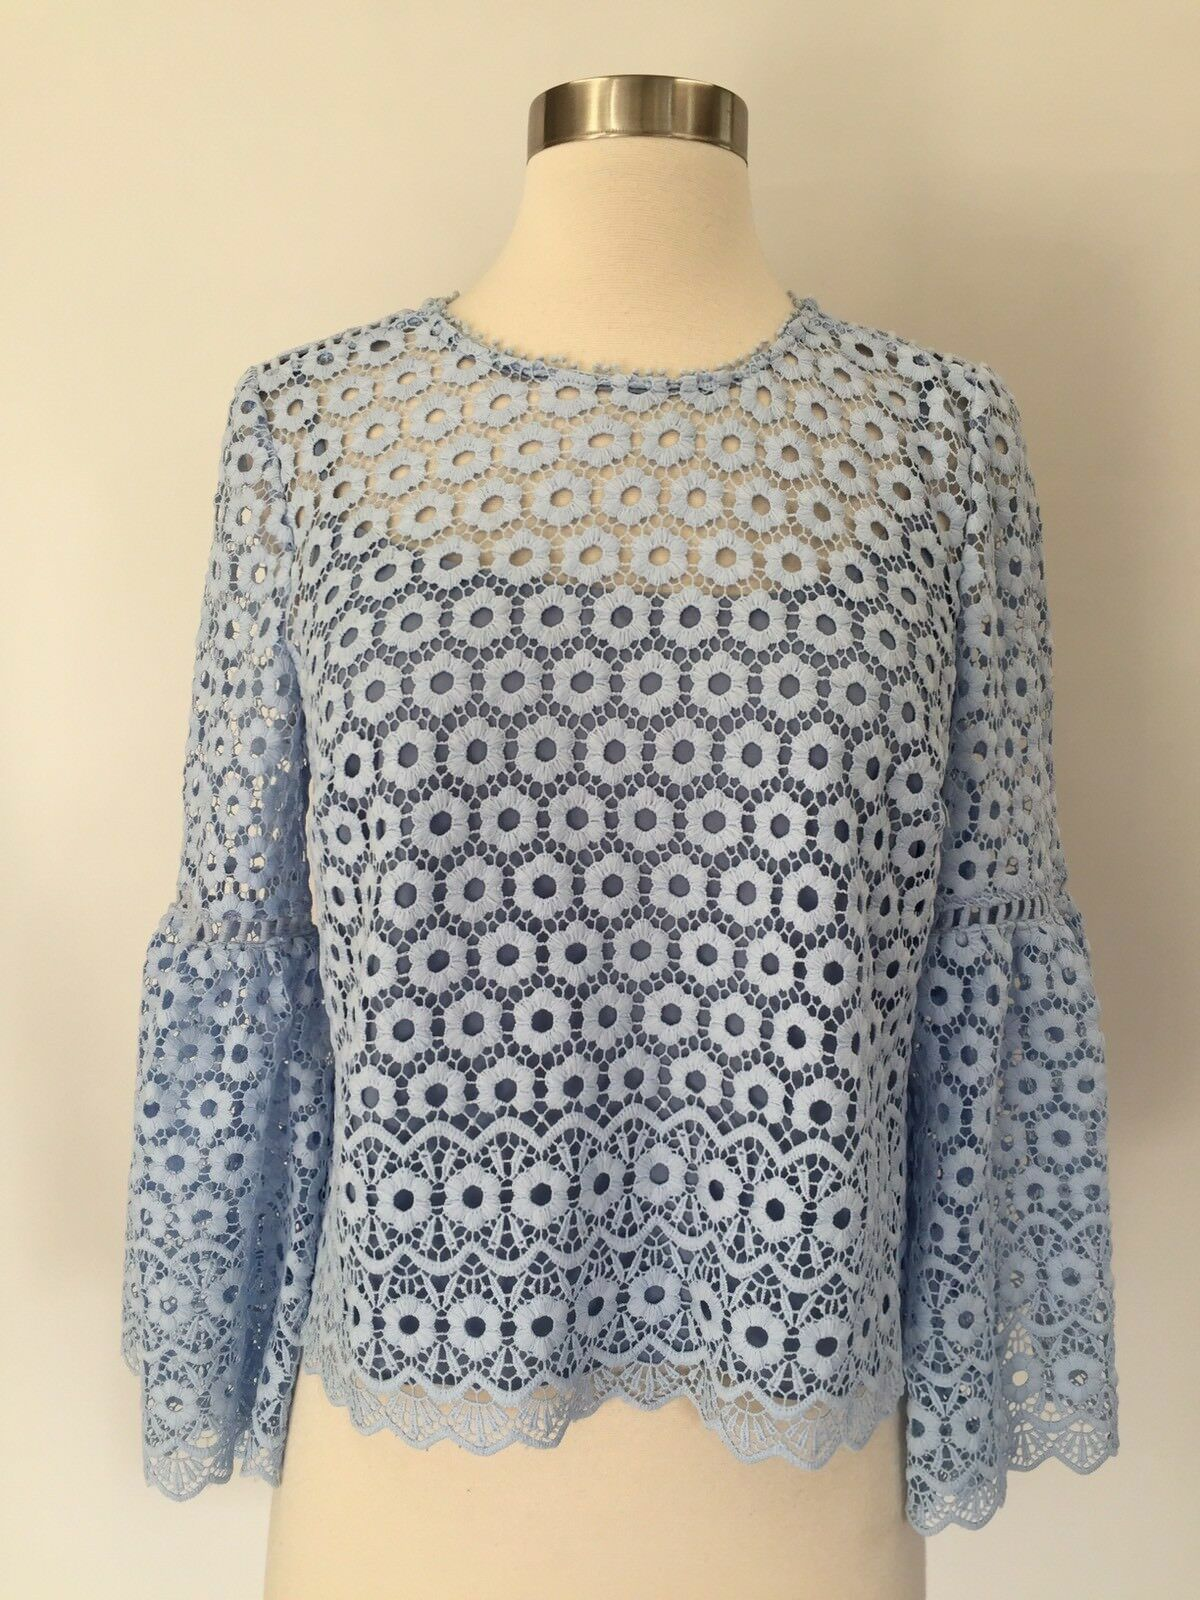 aa32d29ae New J.Crew Daisylace Bell-sleeve Top Blouse Faded Peri Blau Größe